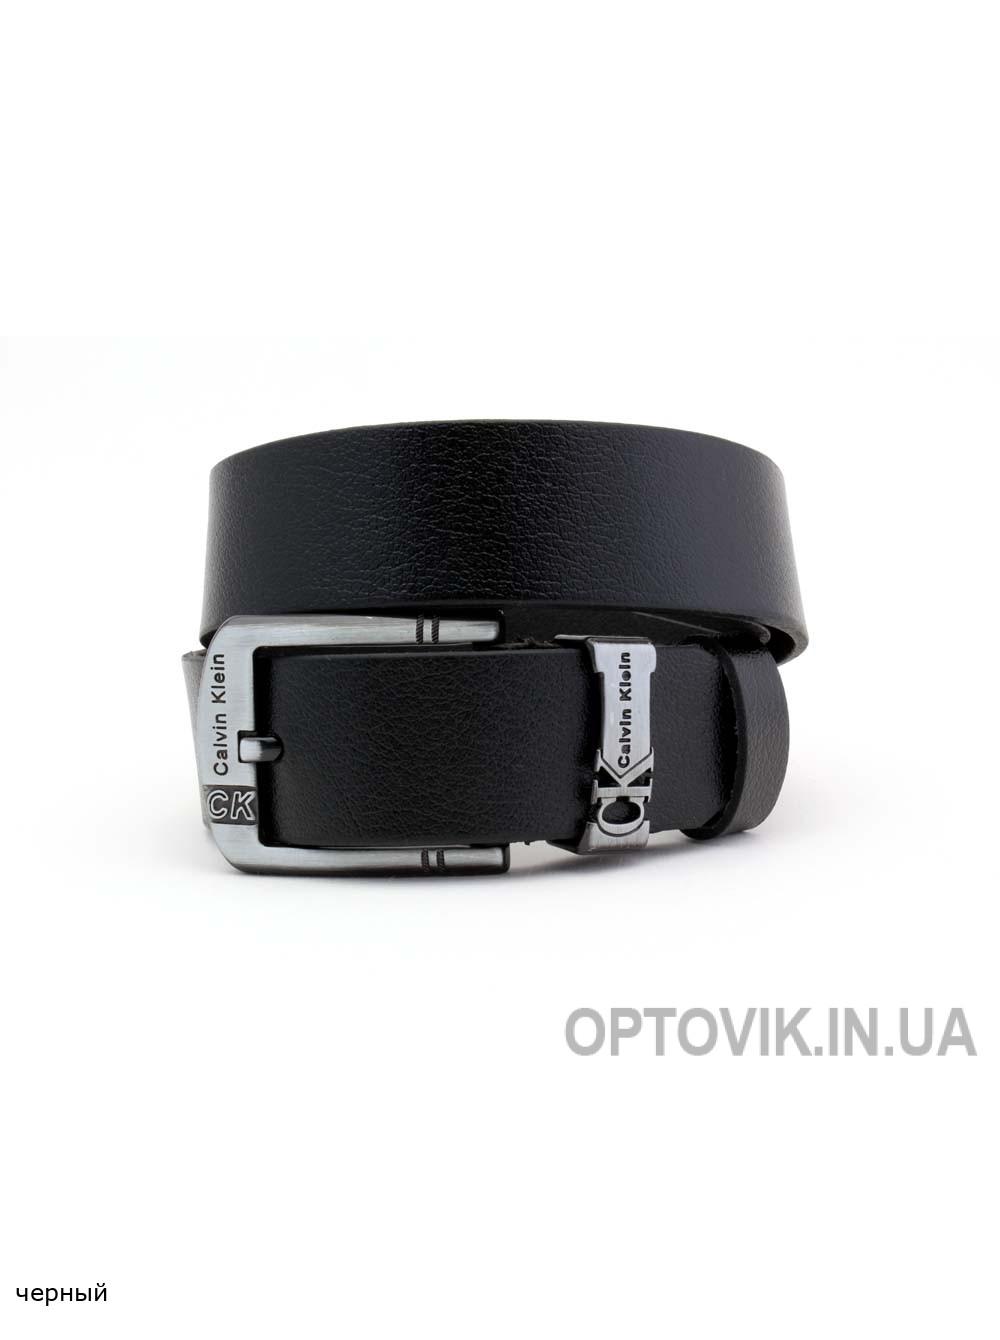 Ремень кожа 40 Real Leather - rl86273-40L